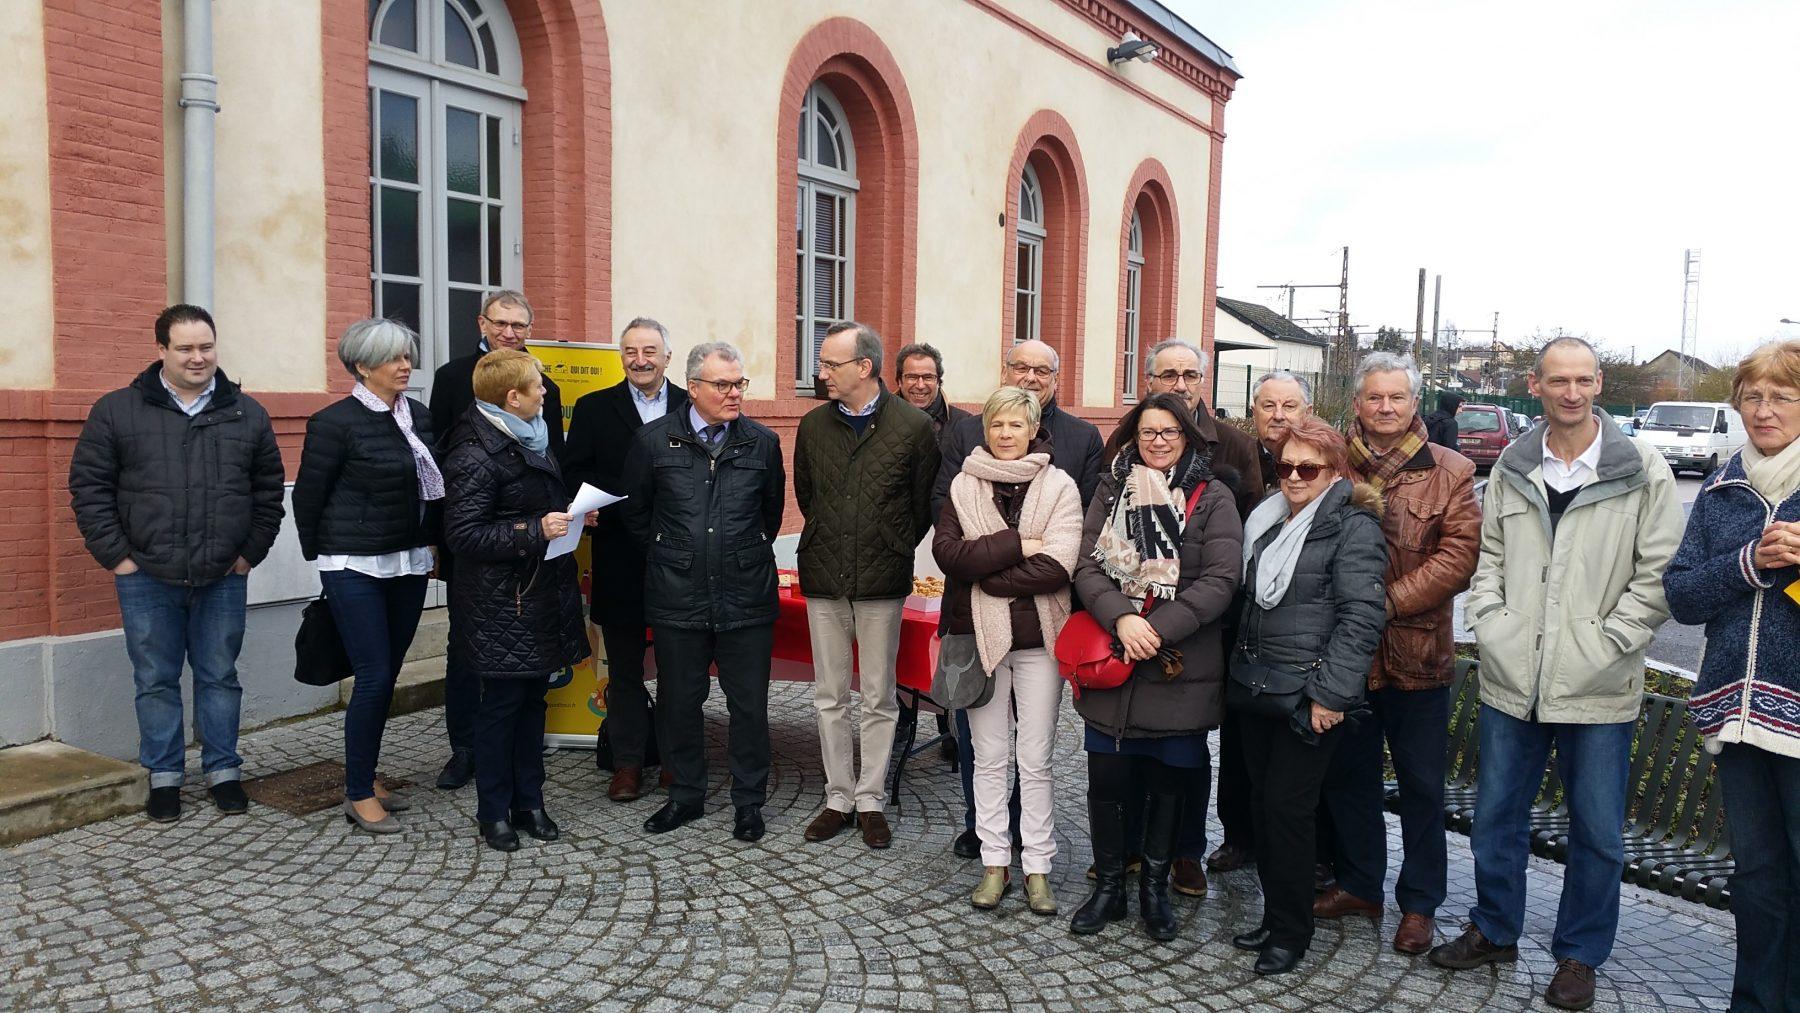 Gare SNCF : la mobilisation porte ses fruits